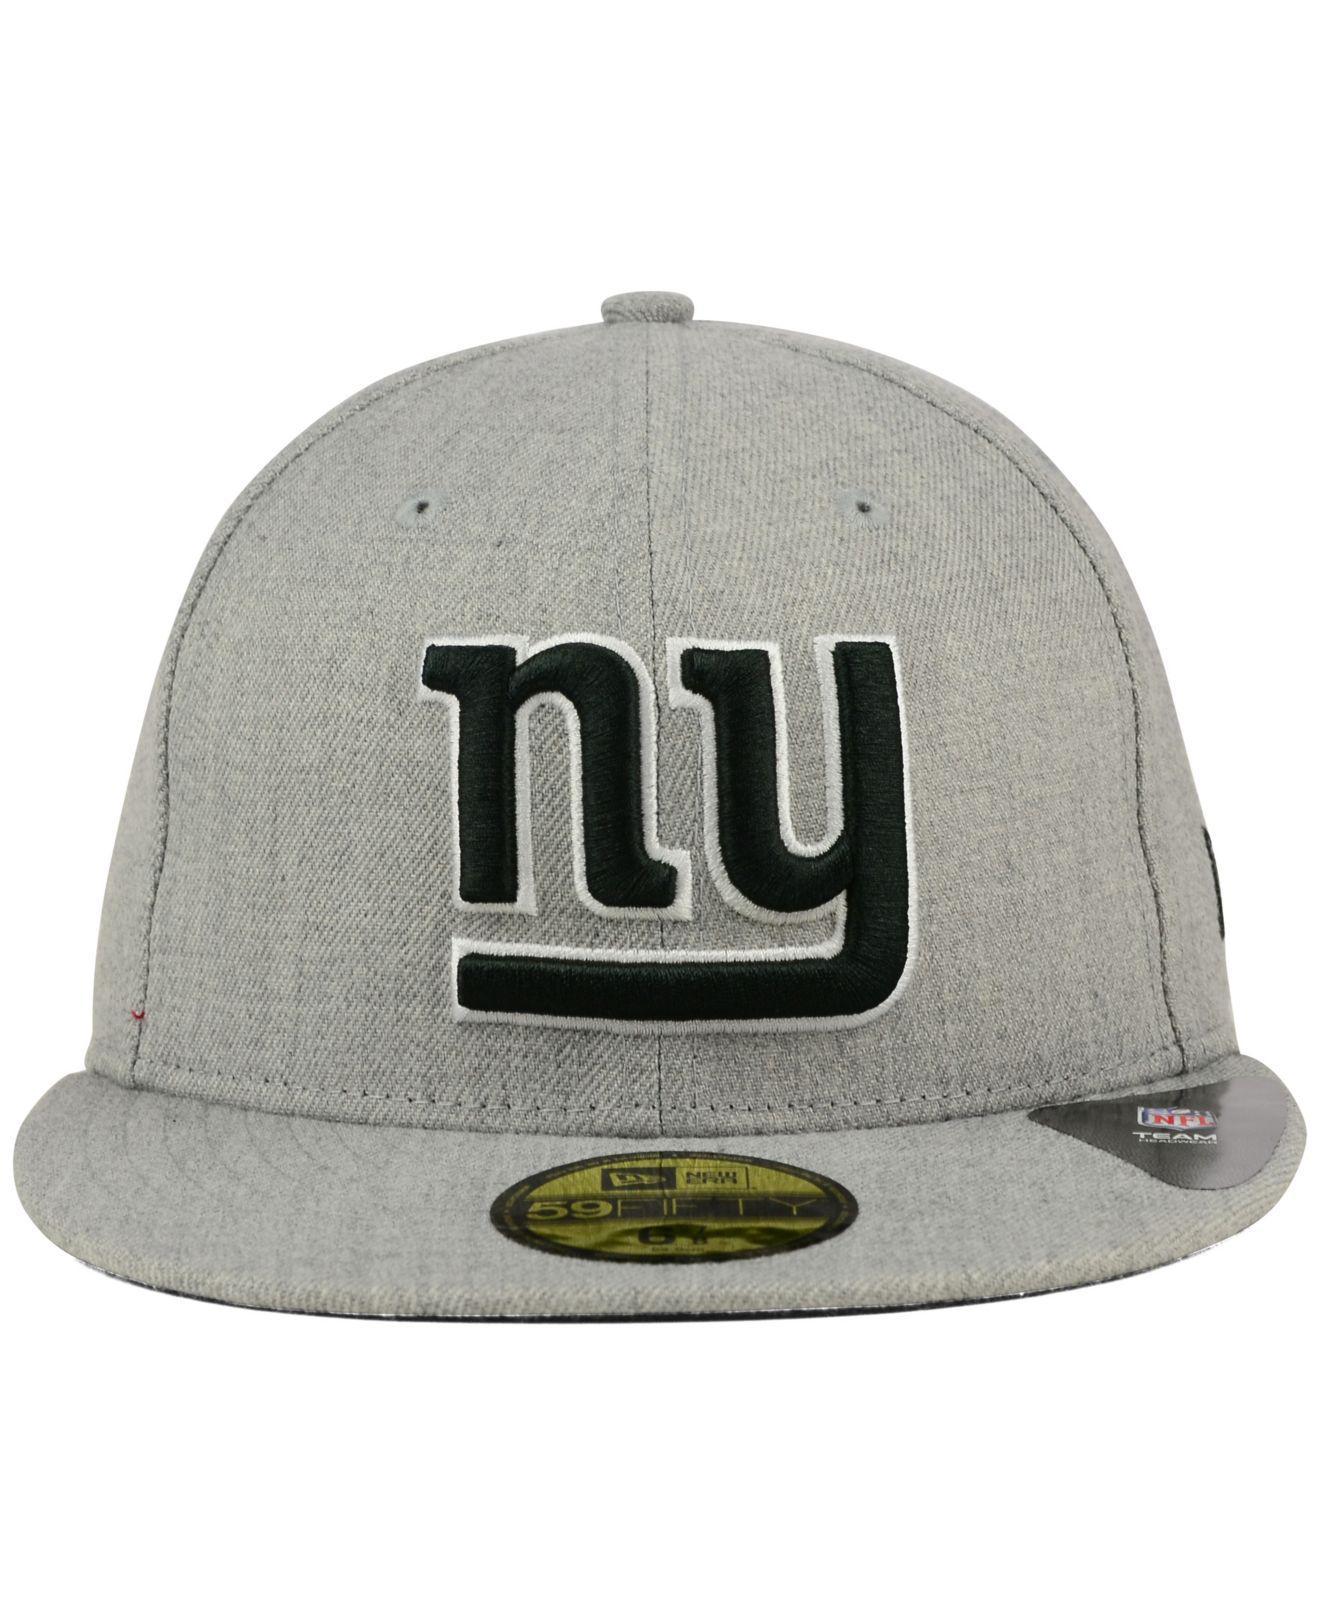 Lyst - KTZ New York Giants Heather Black White 59fifty Cap in Gray for Men df65942ab